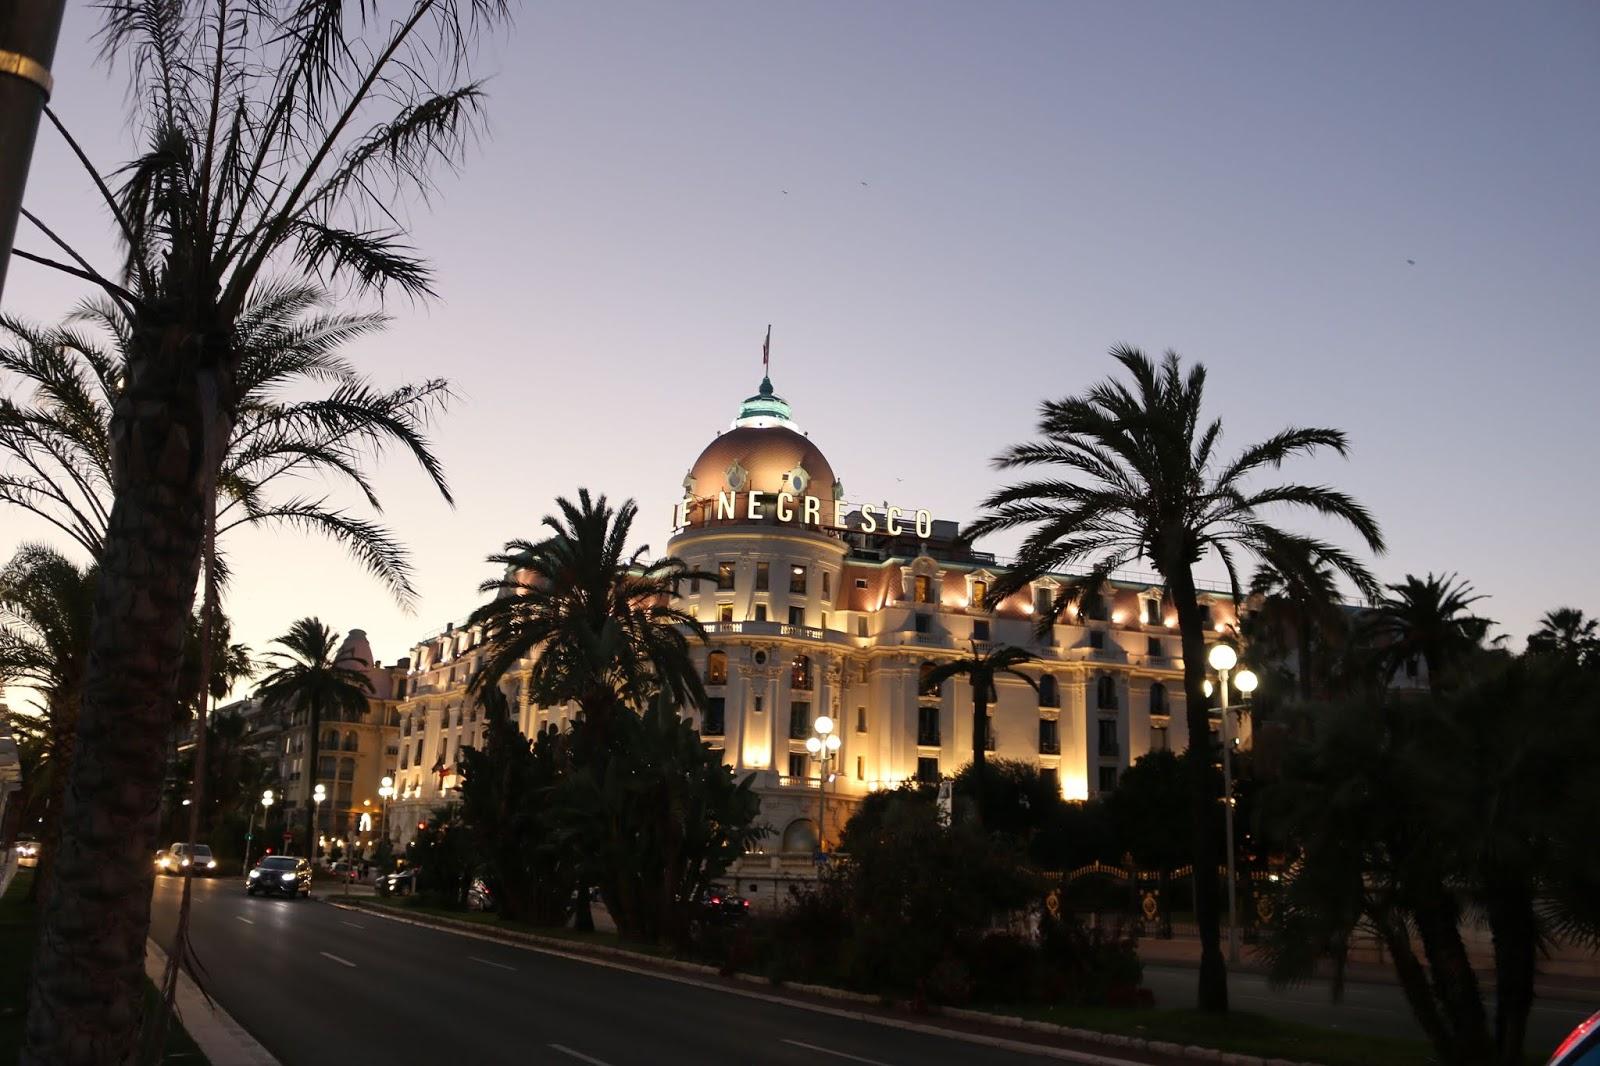 Nice Hotel Le Negresco